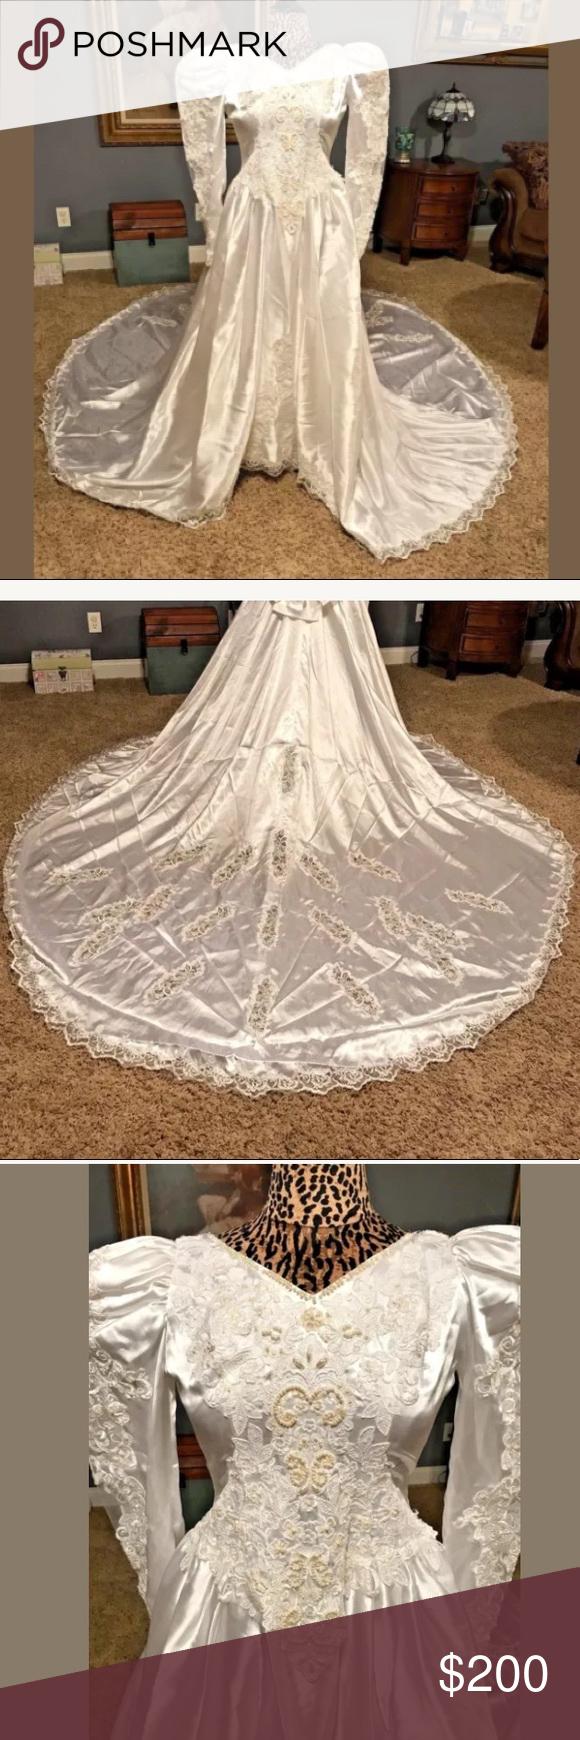 White puffy wedding dresses  Vintage White Wedding Gown Puffy Sleeves Train  Pinterest